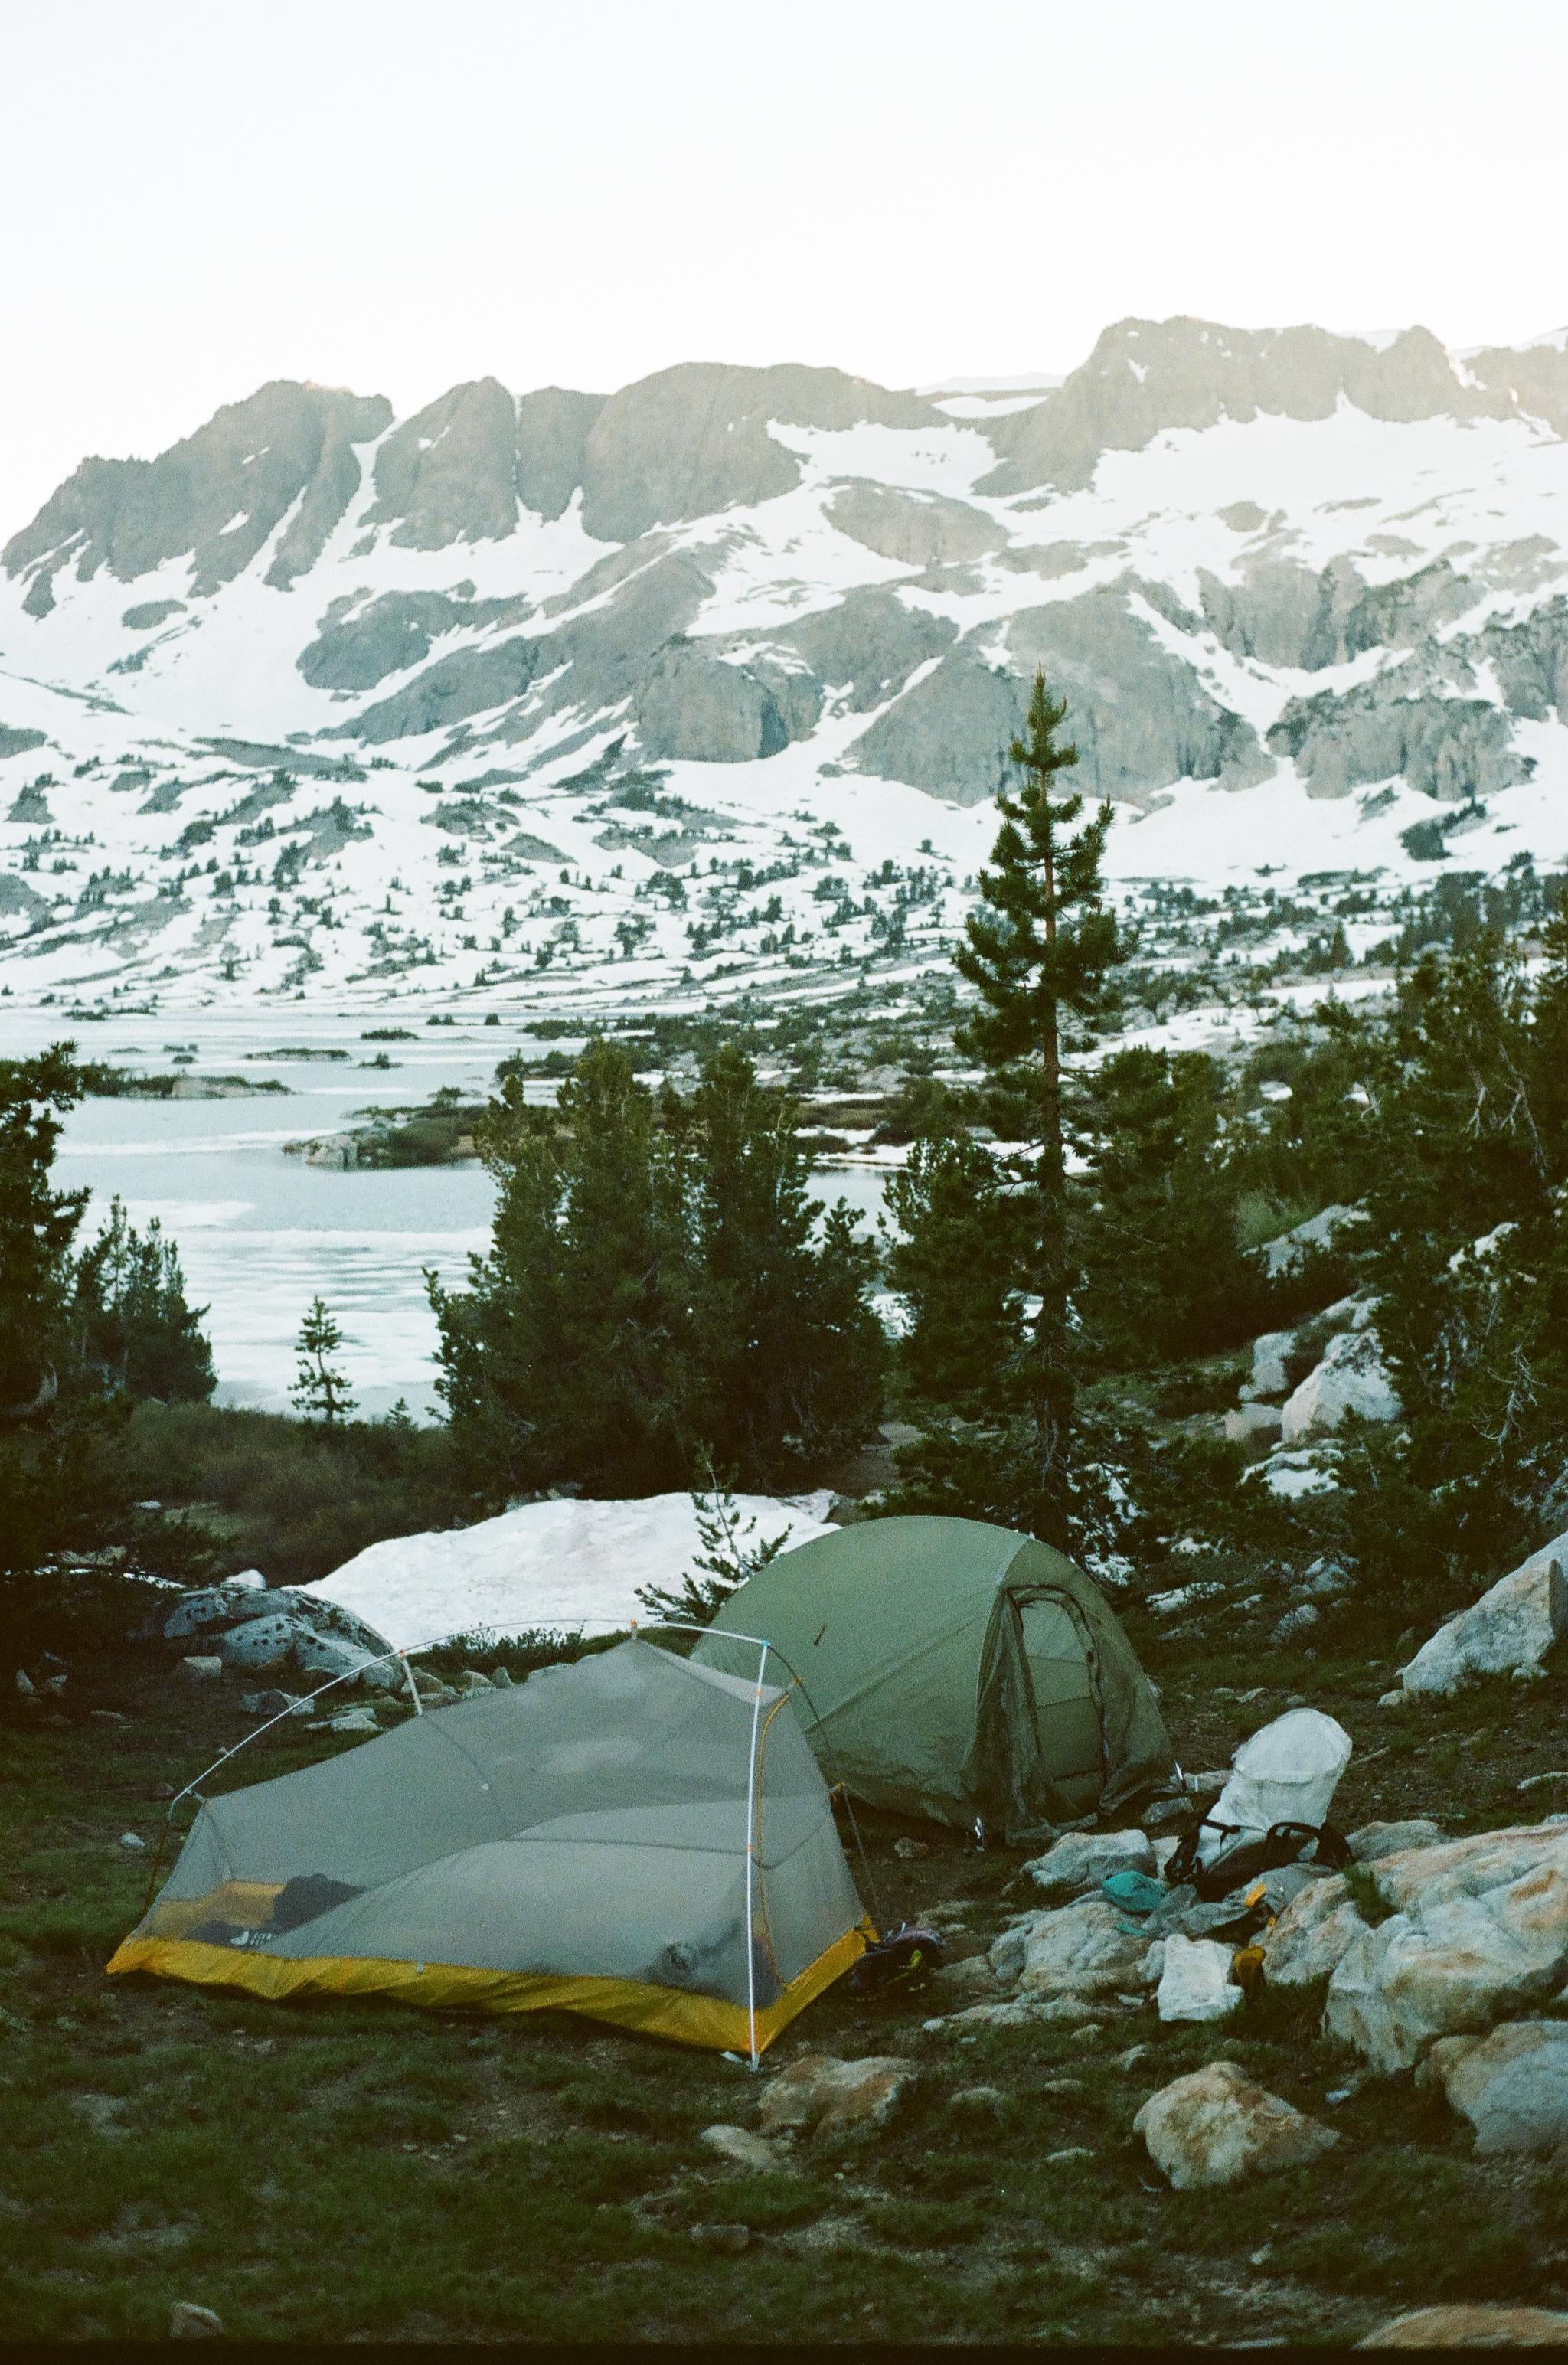 Camp at Thousand Island Lake, 35mm film